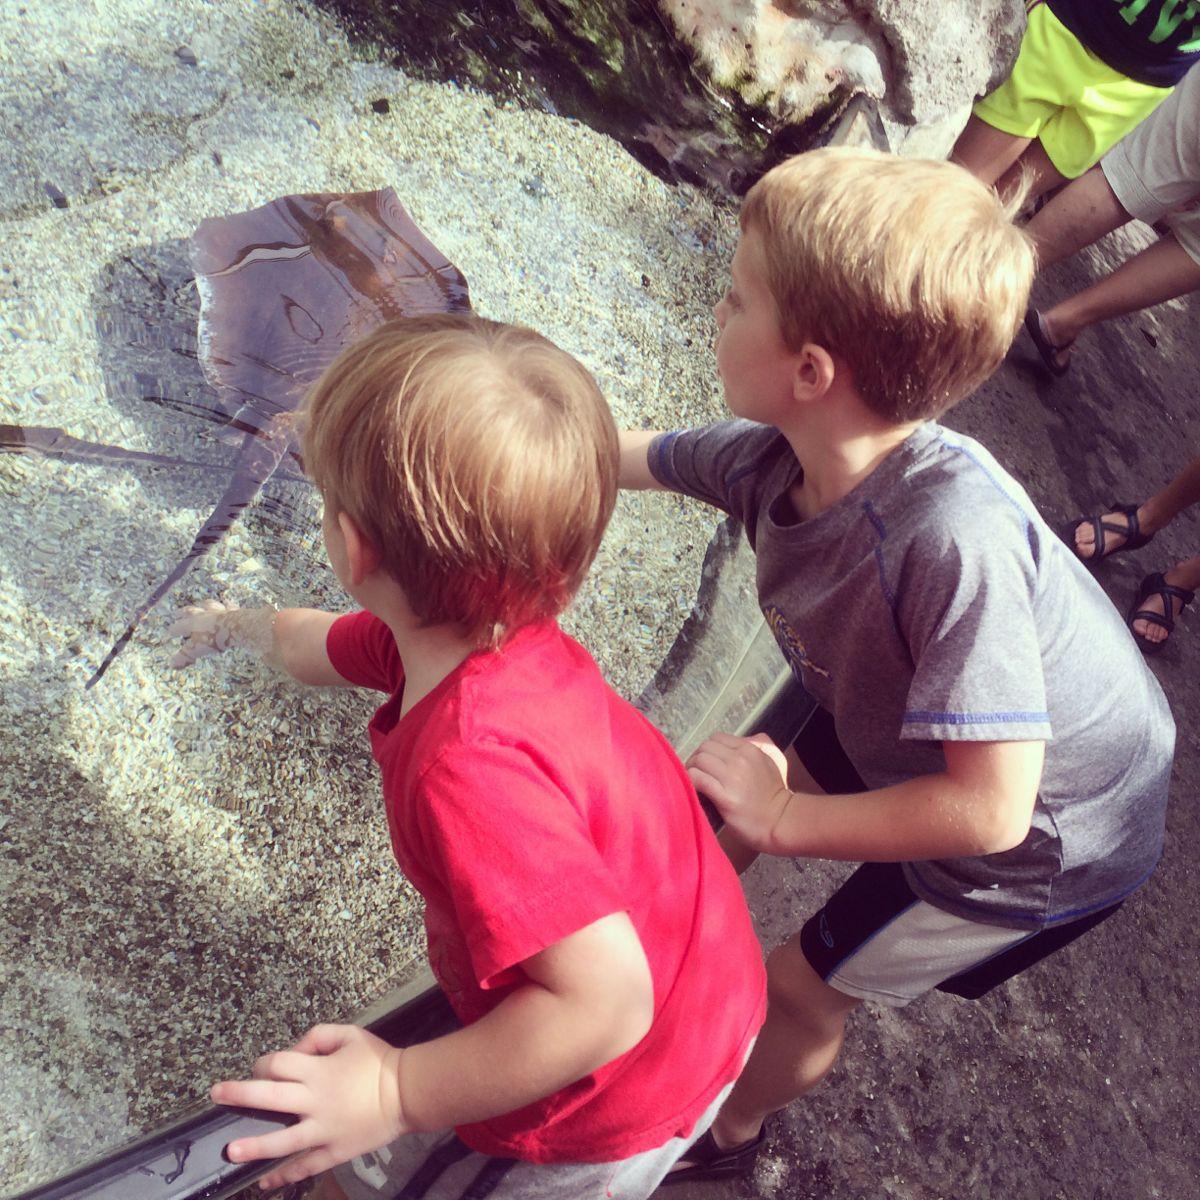 Sam & Will petting stingrays at the Tennessee Aquarium.